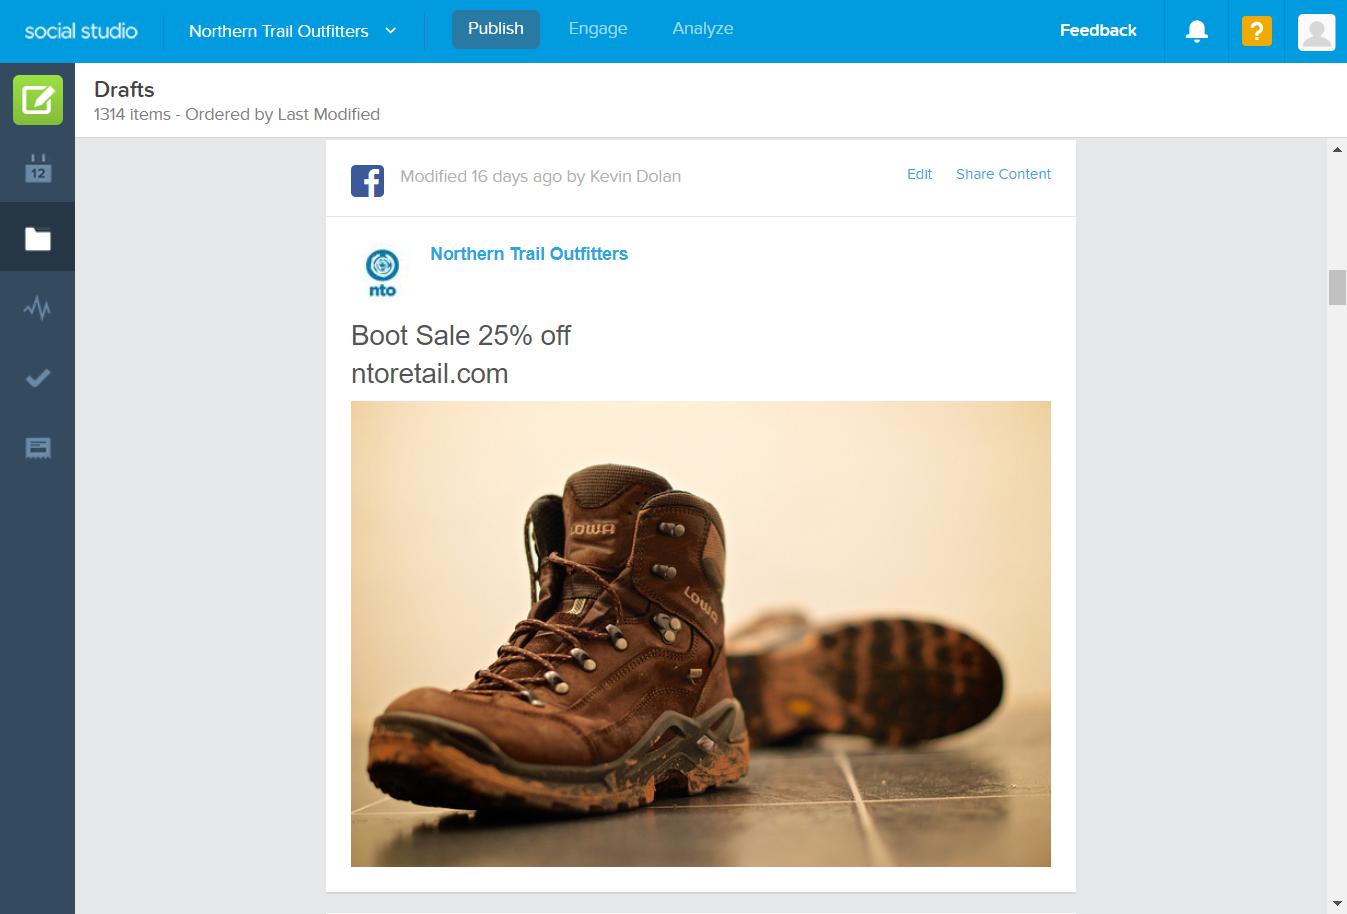 The Drafts folder interface in Social Studio